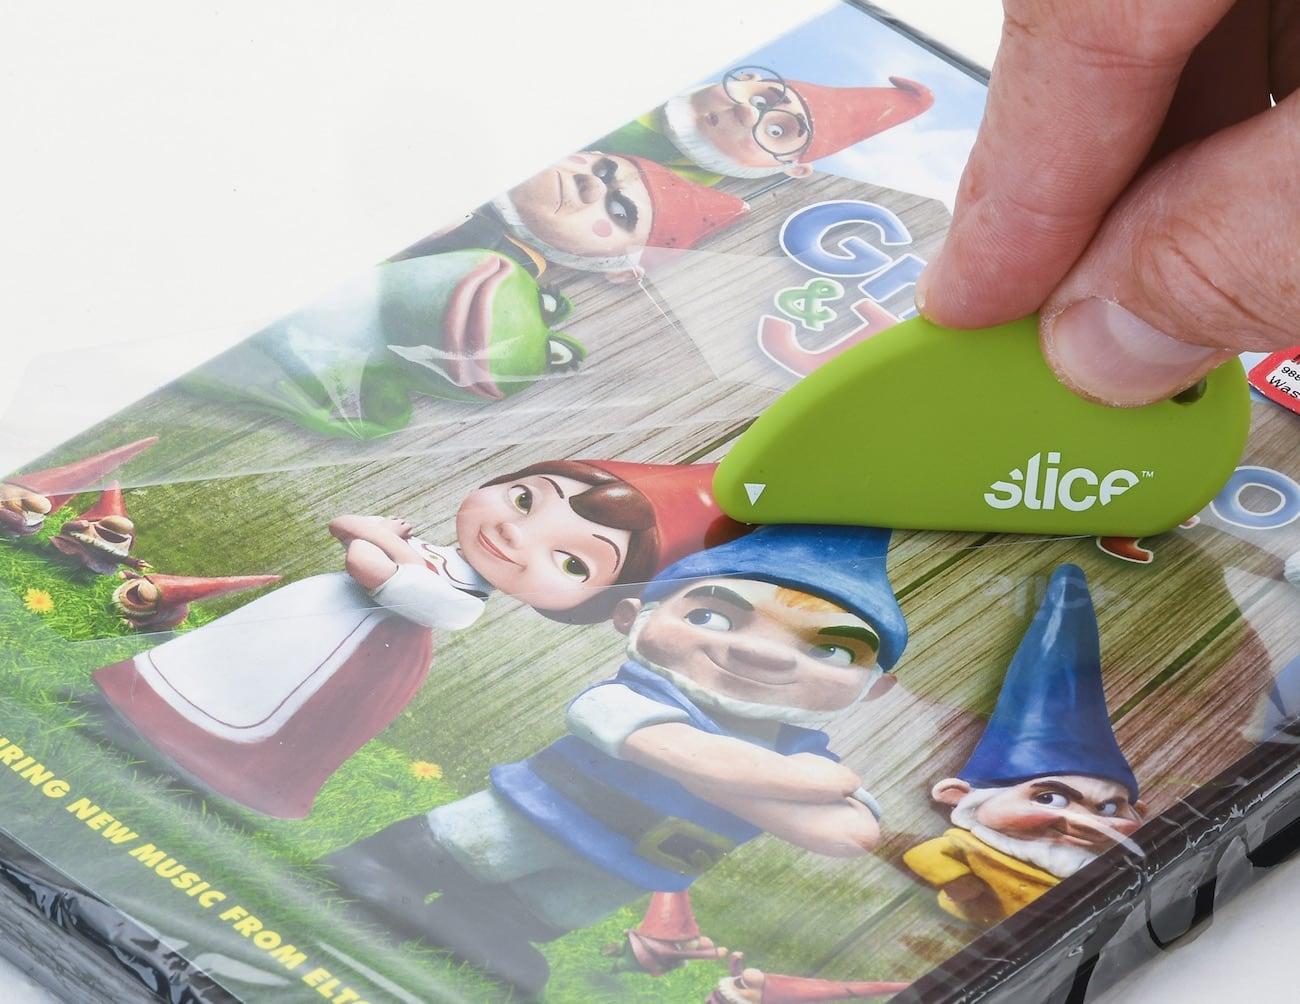 Slice Everyday Safety Cutter